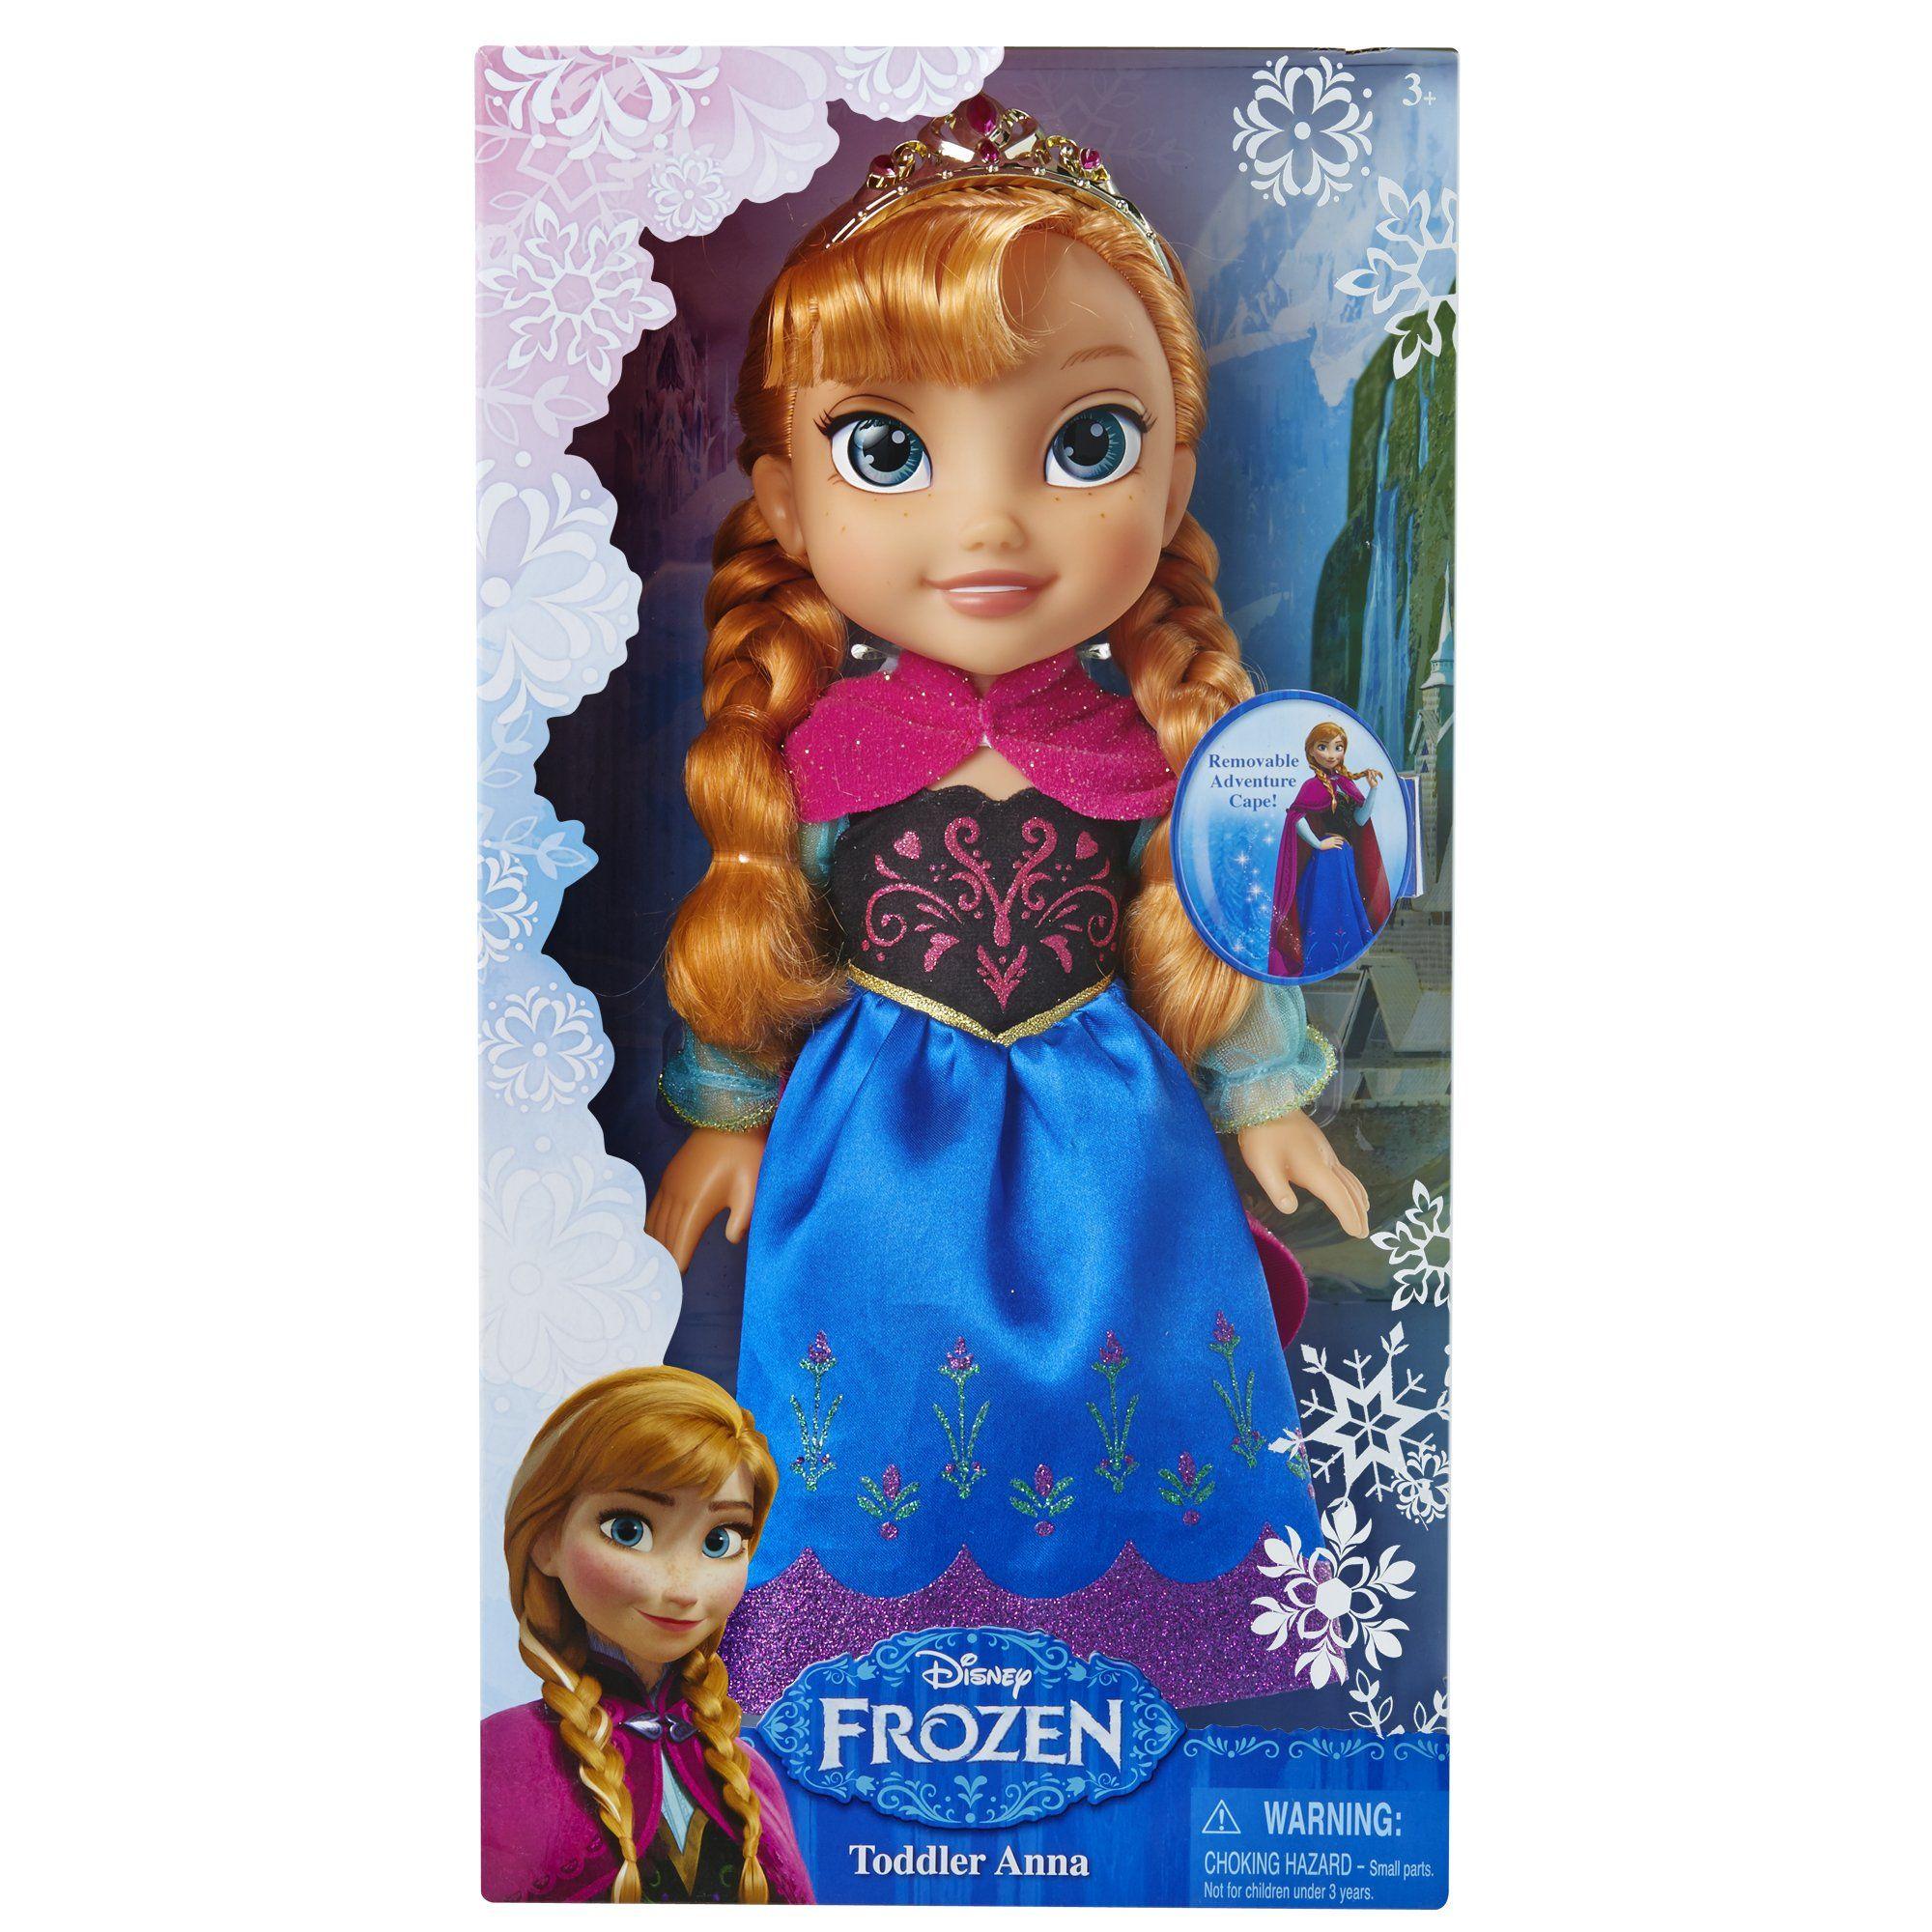 Disney reine des neiges 86867 poup e anna deluxe 15 - Ana reine des neiges ...